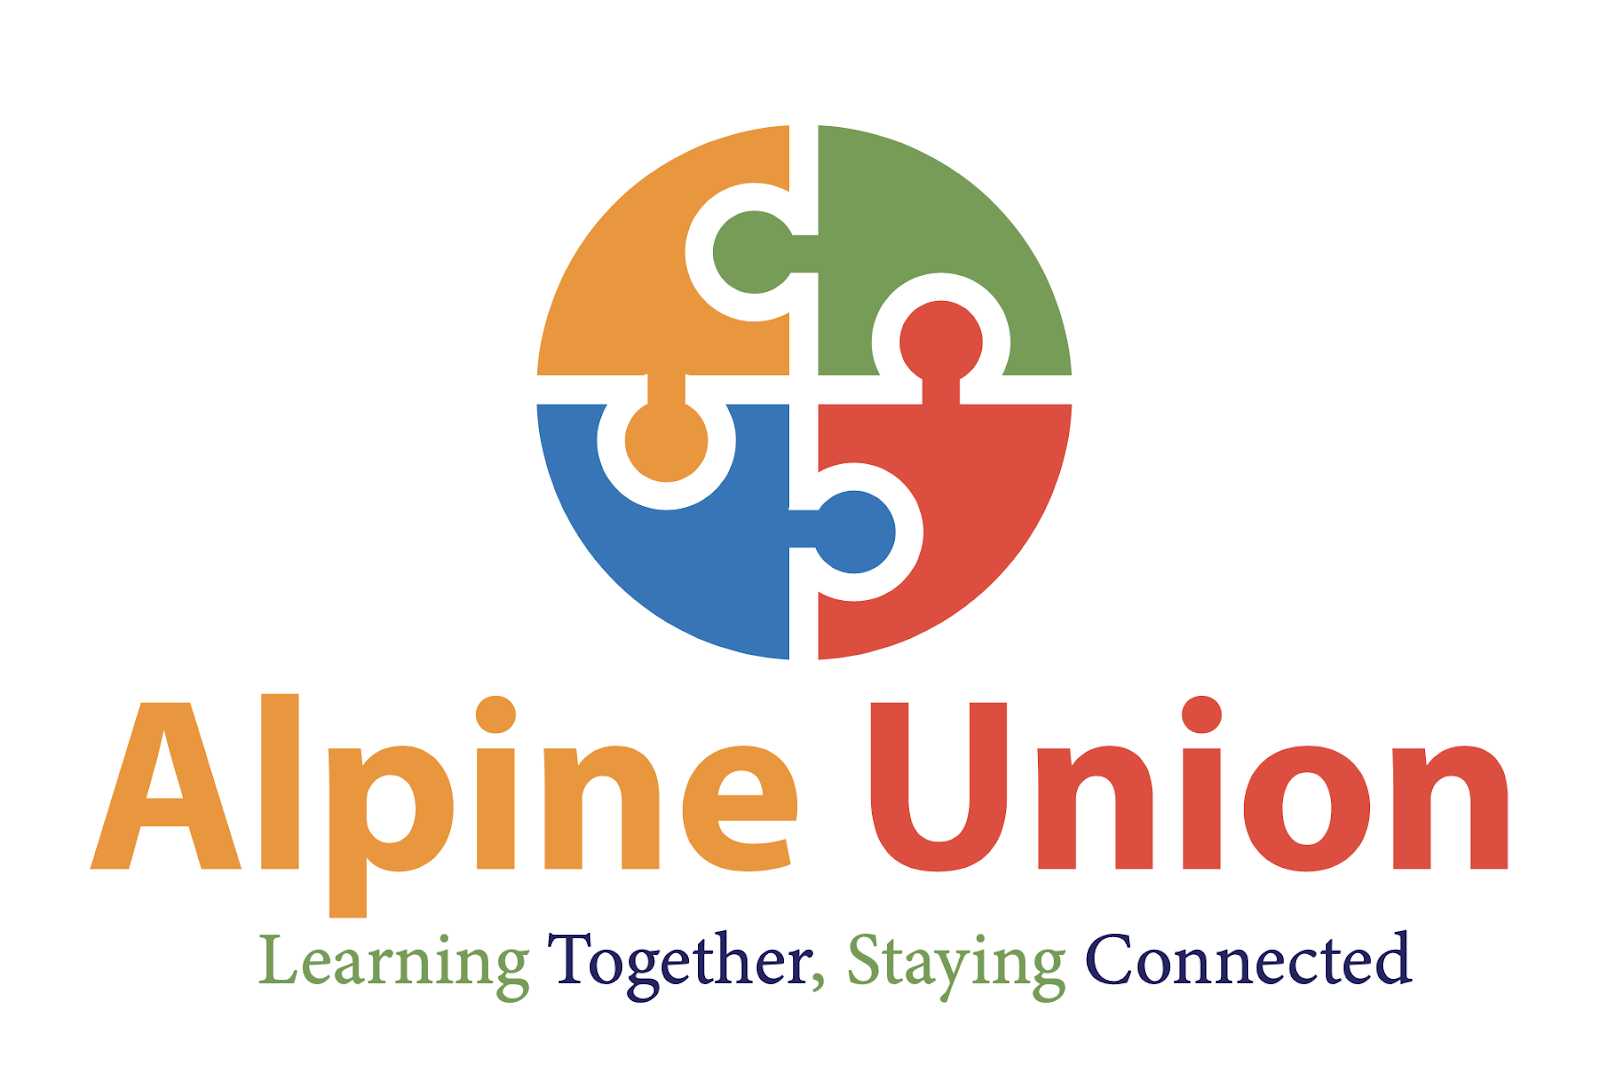 Alpine union